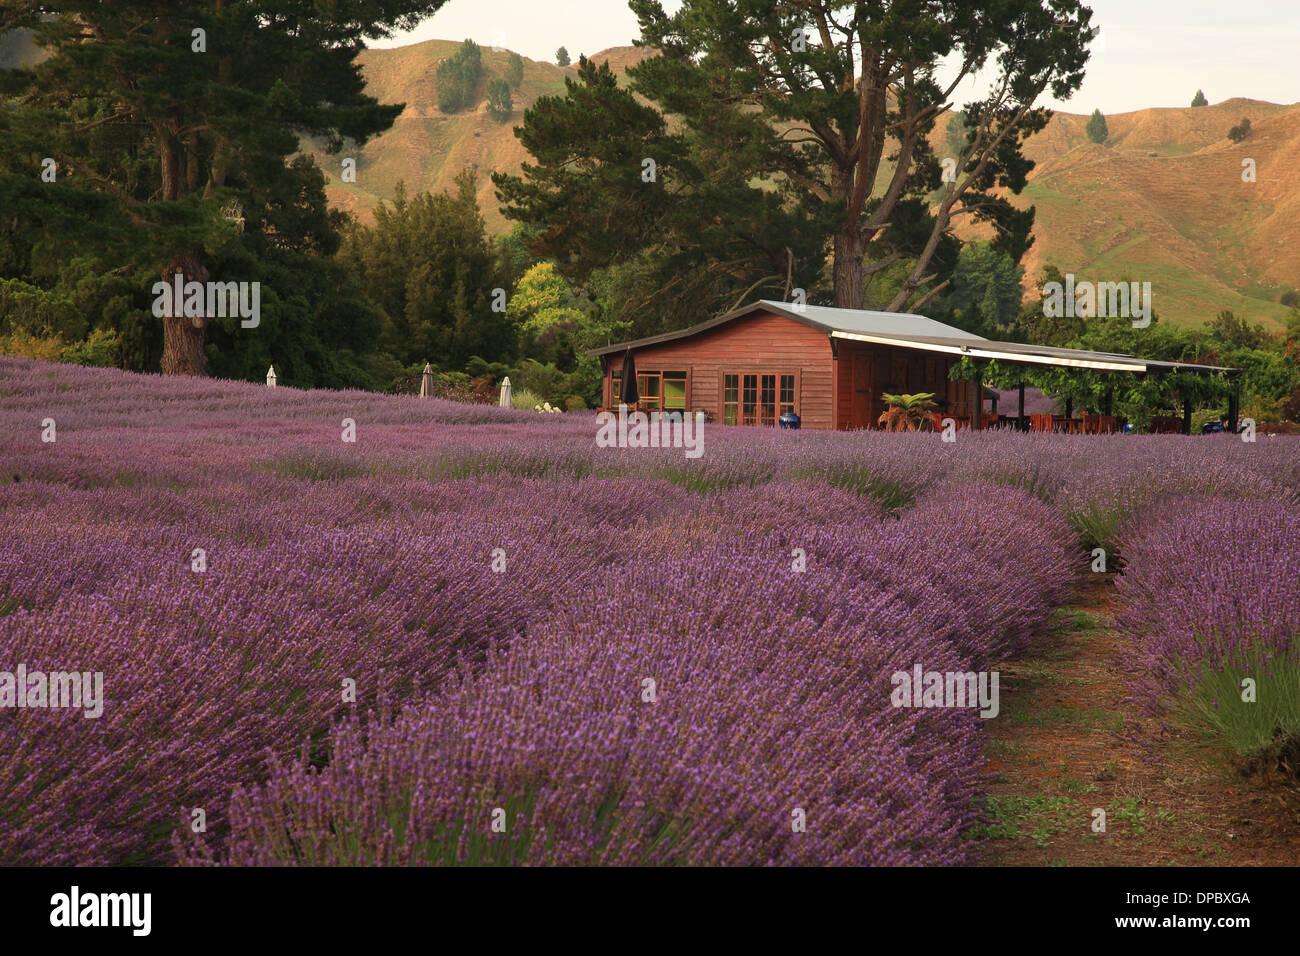 Lavender Farm, Forgotten World Highway 43, Taumarunu, North Island, New Zealand - Stock Image